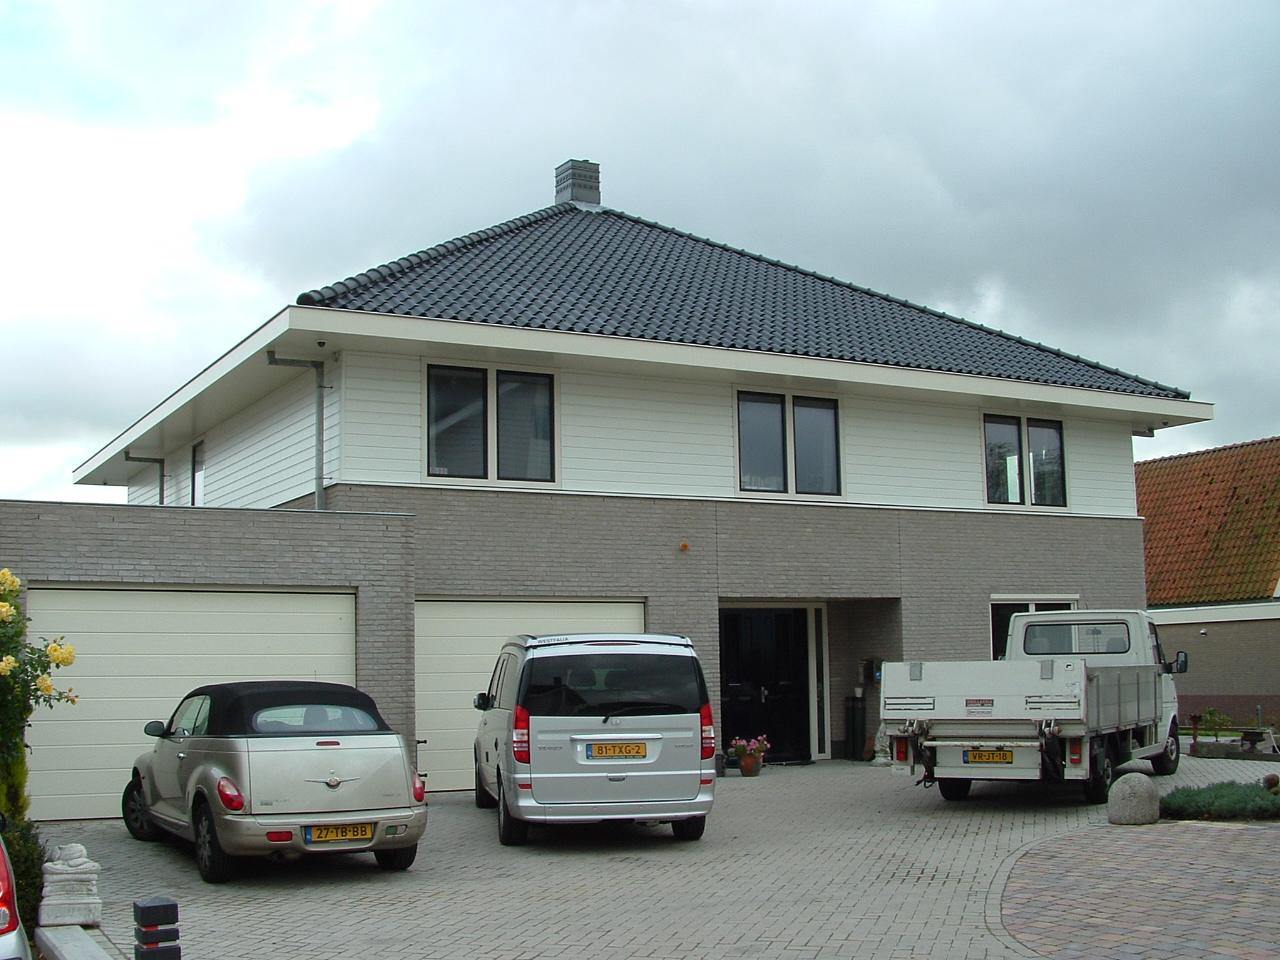 ab-visie woonhuis fam Zonneveld